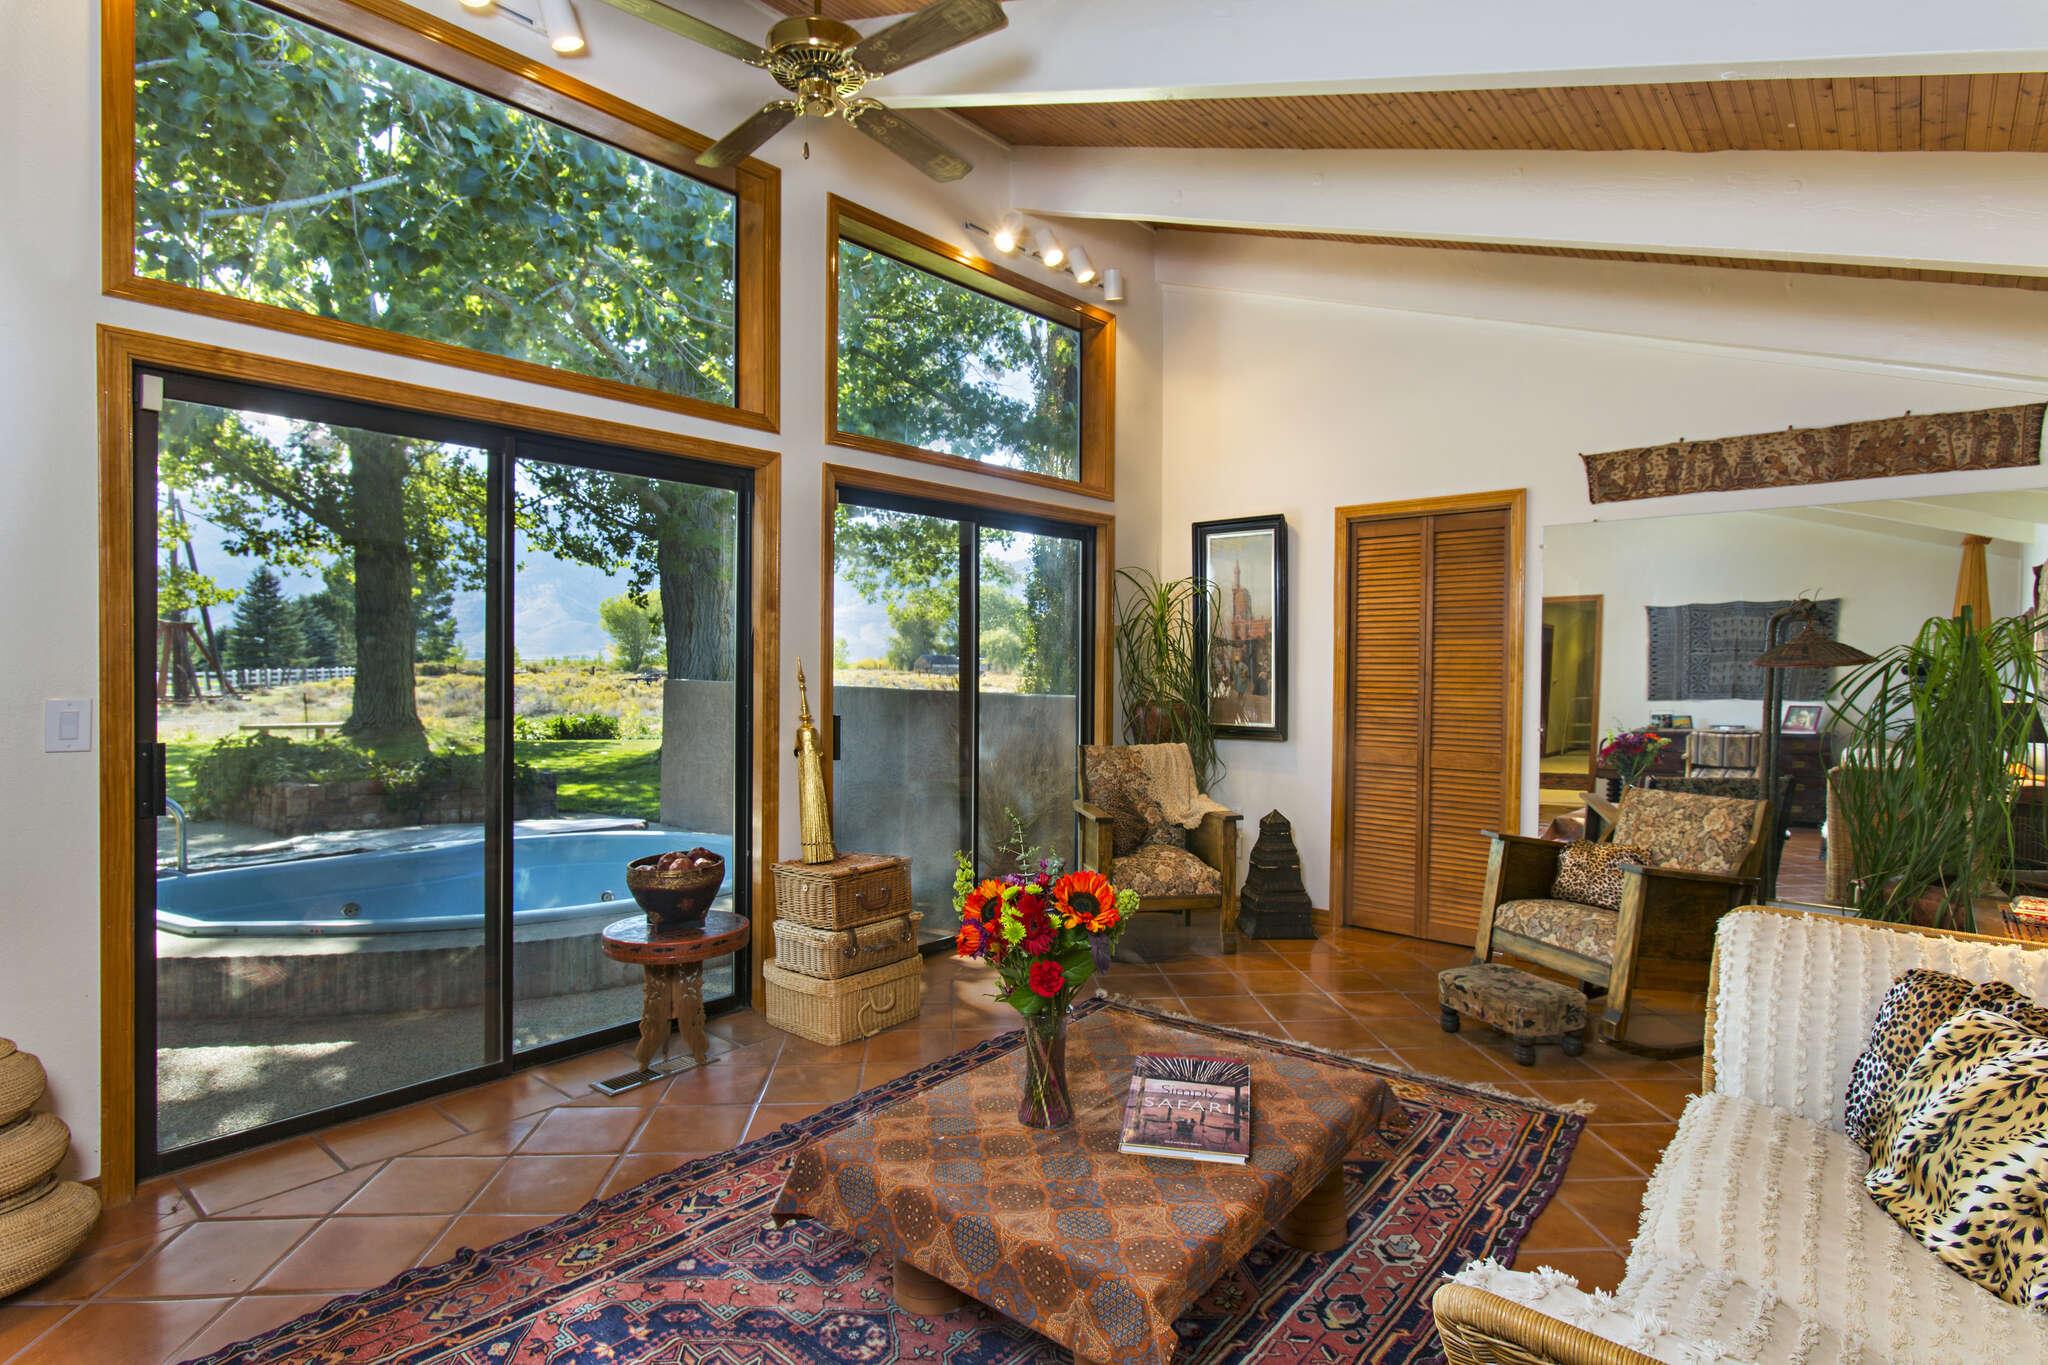 Single Family for Sale at 1748 Westwood Minden, Nevada 89423 United States